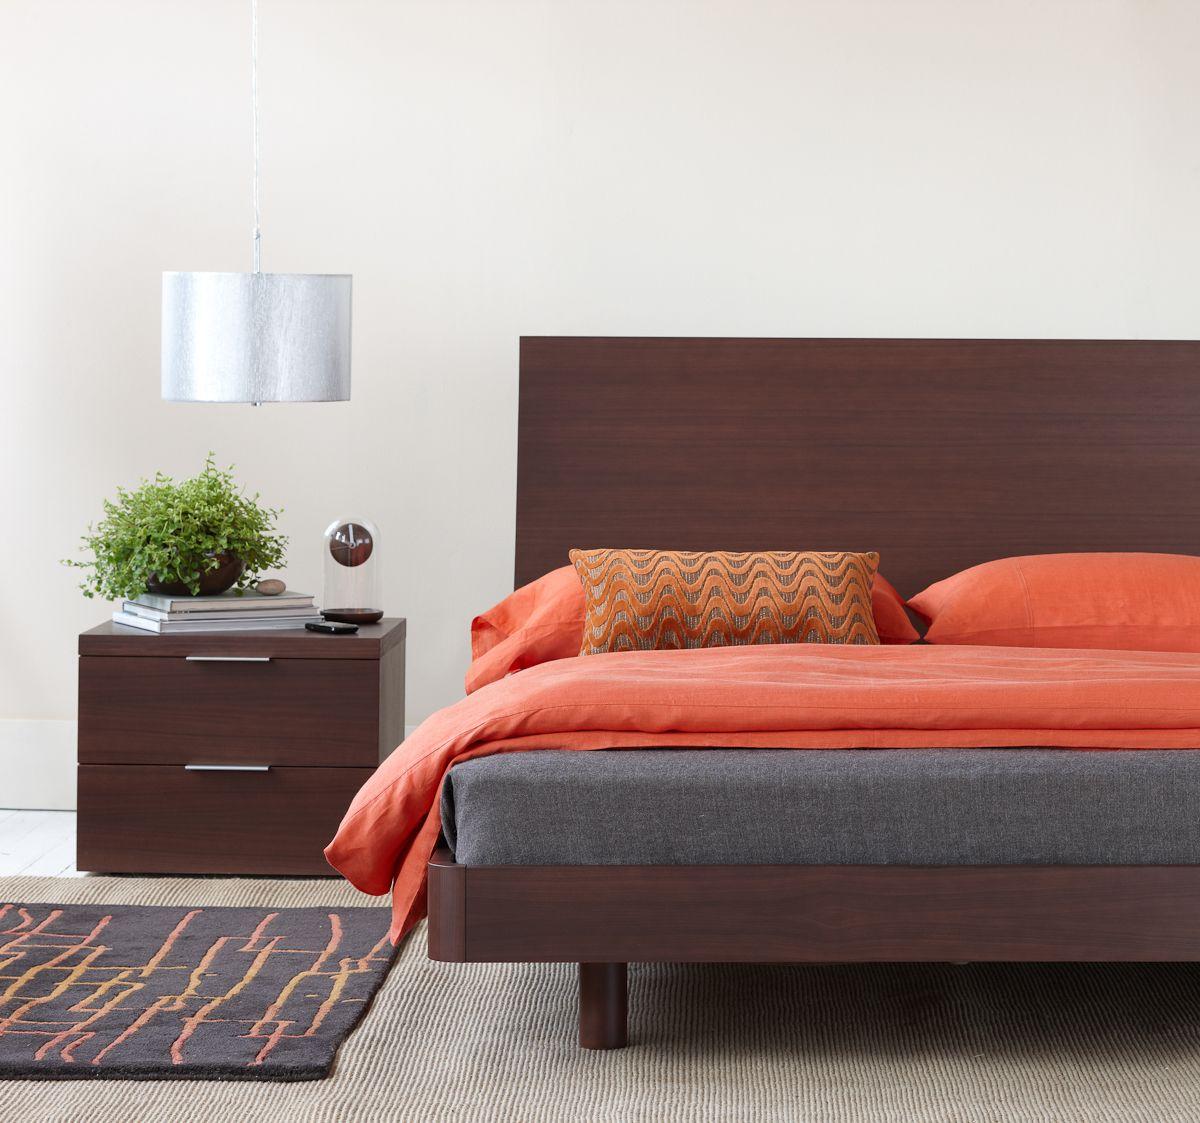 Luna bed by Mobican New mobican contempora